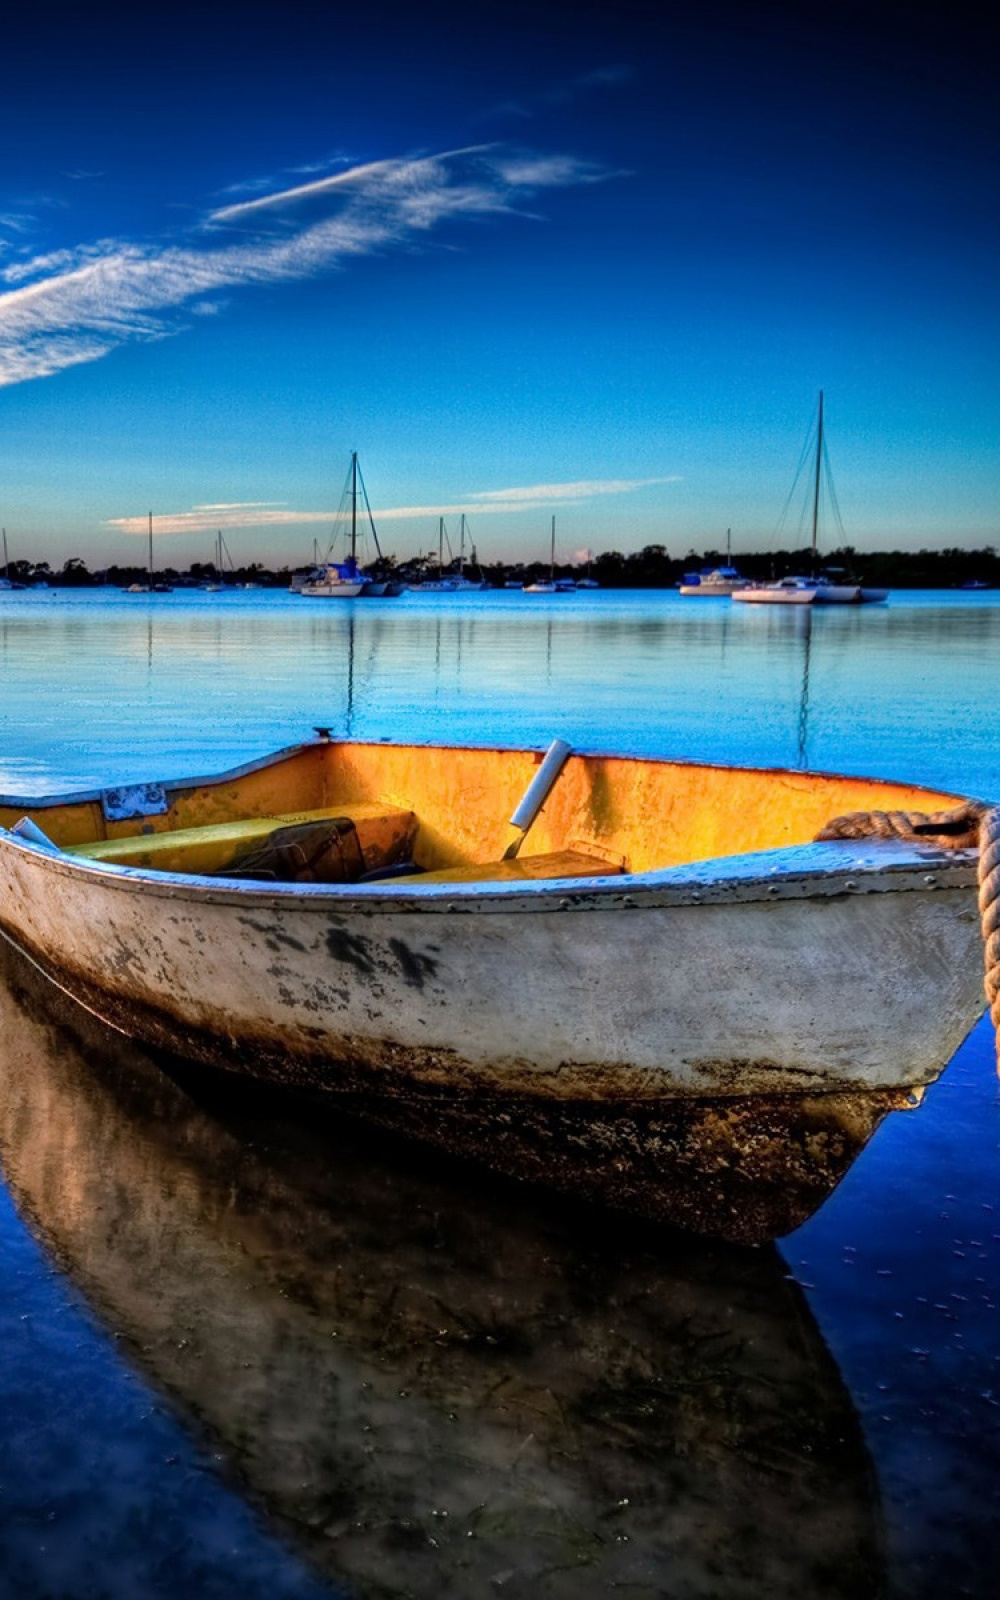 Docked Wooden Boat iPhone 6 Plus HD Wallpaper iPod Wallpaper 1000x1600